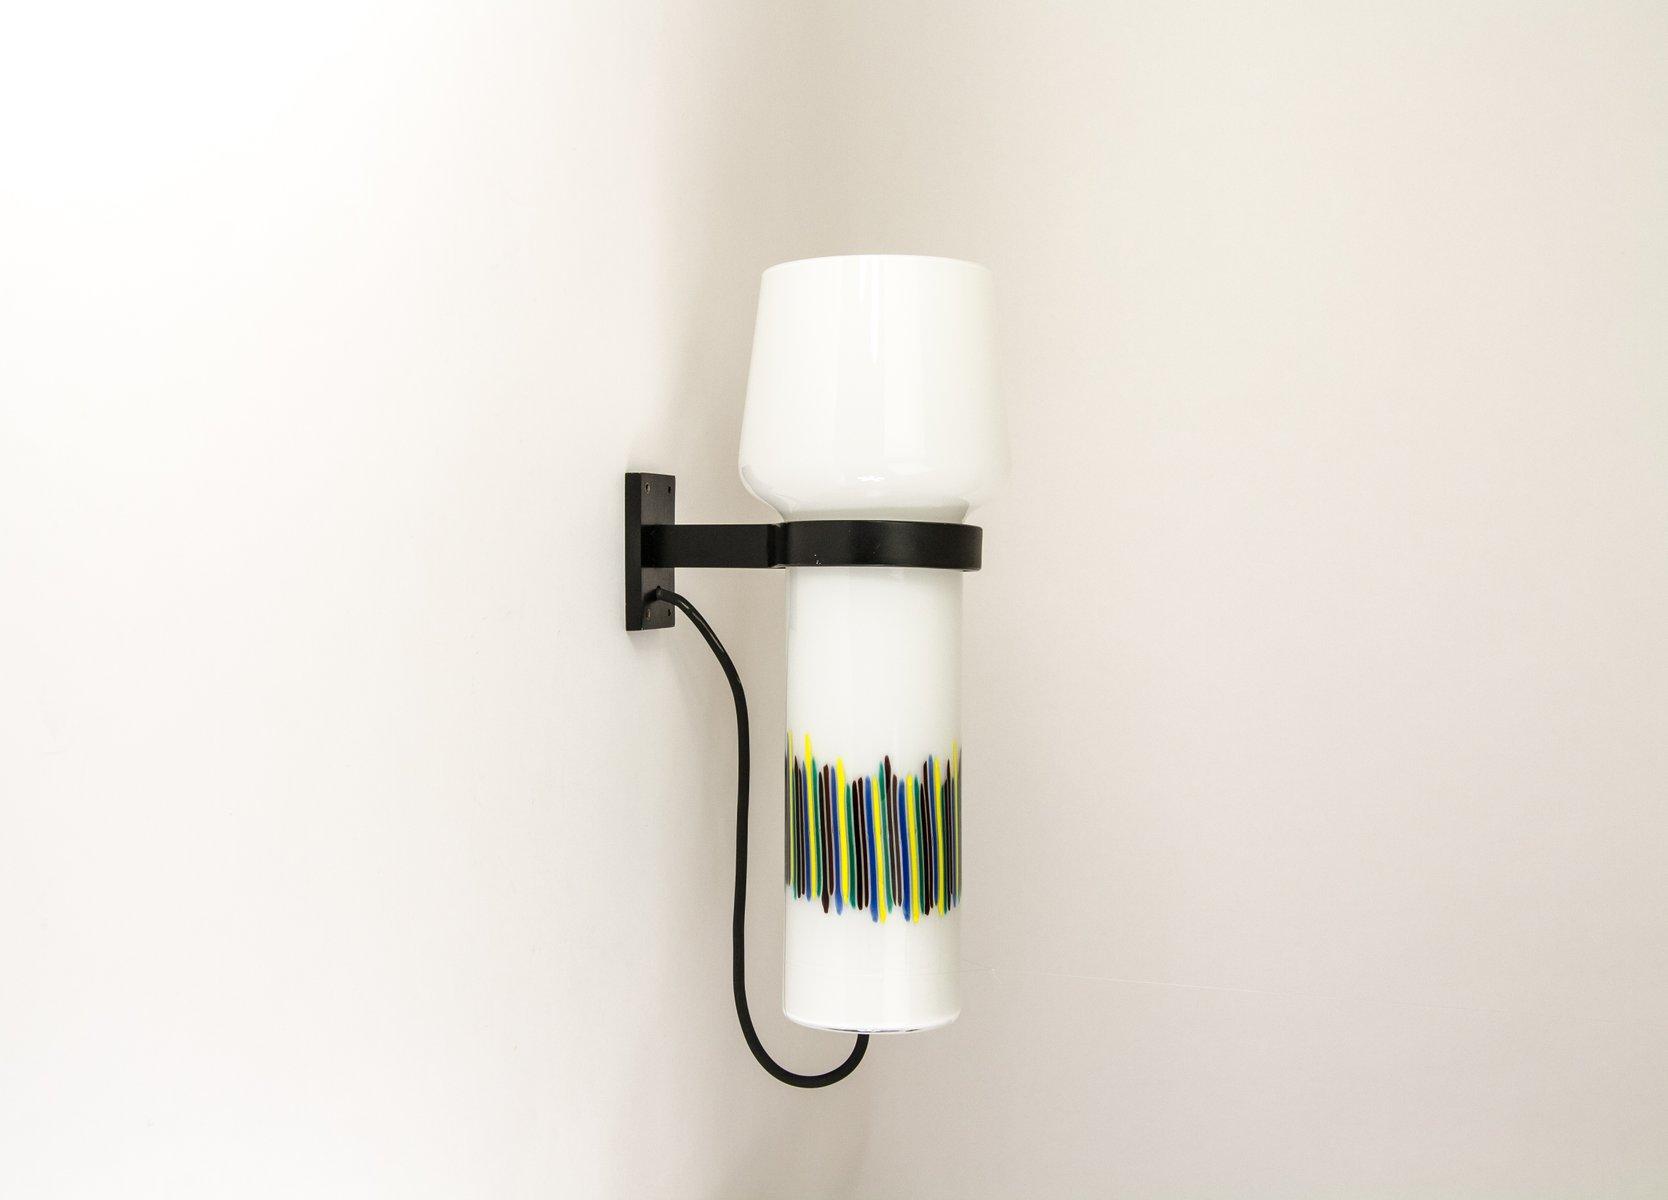 Polychrome handgeblasene Wandlampe von Massimo Vignelli für Venini, 19...